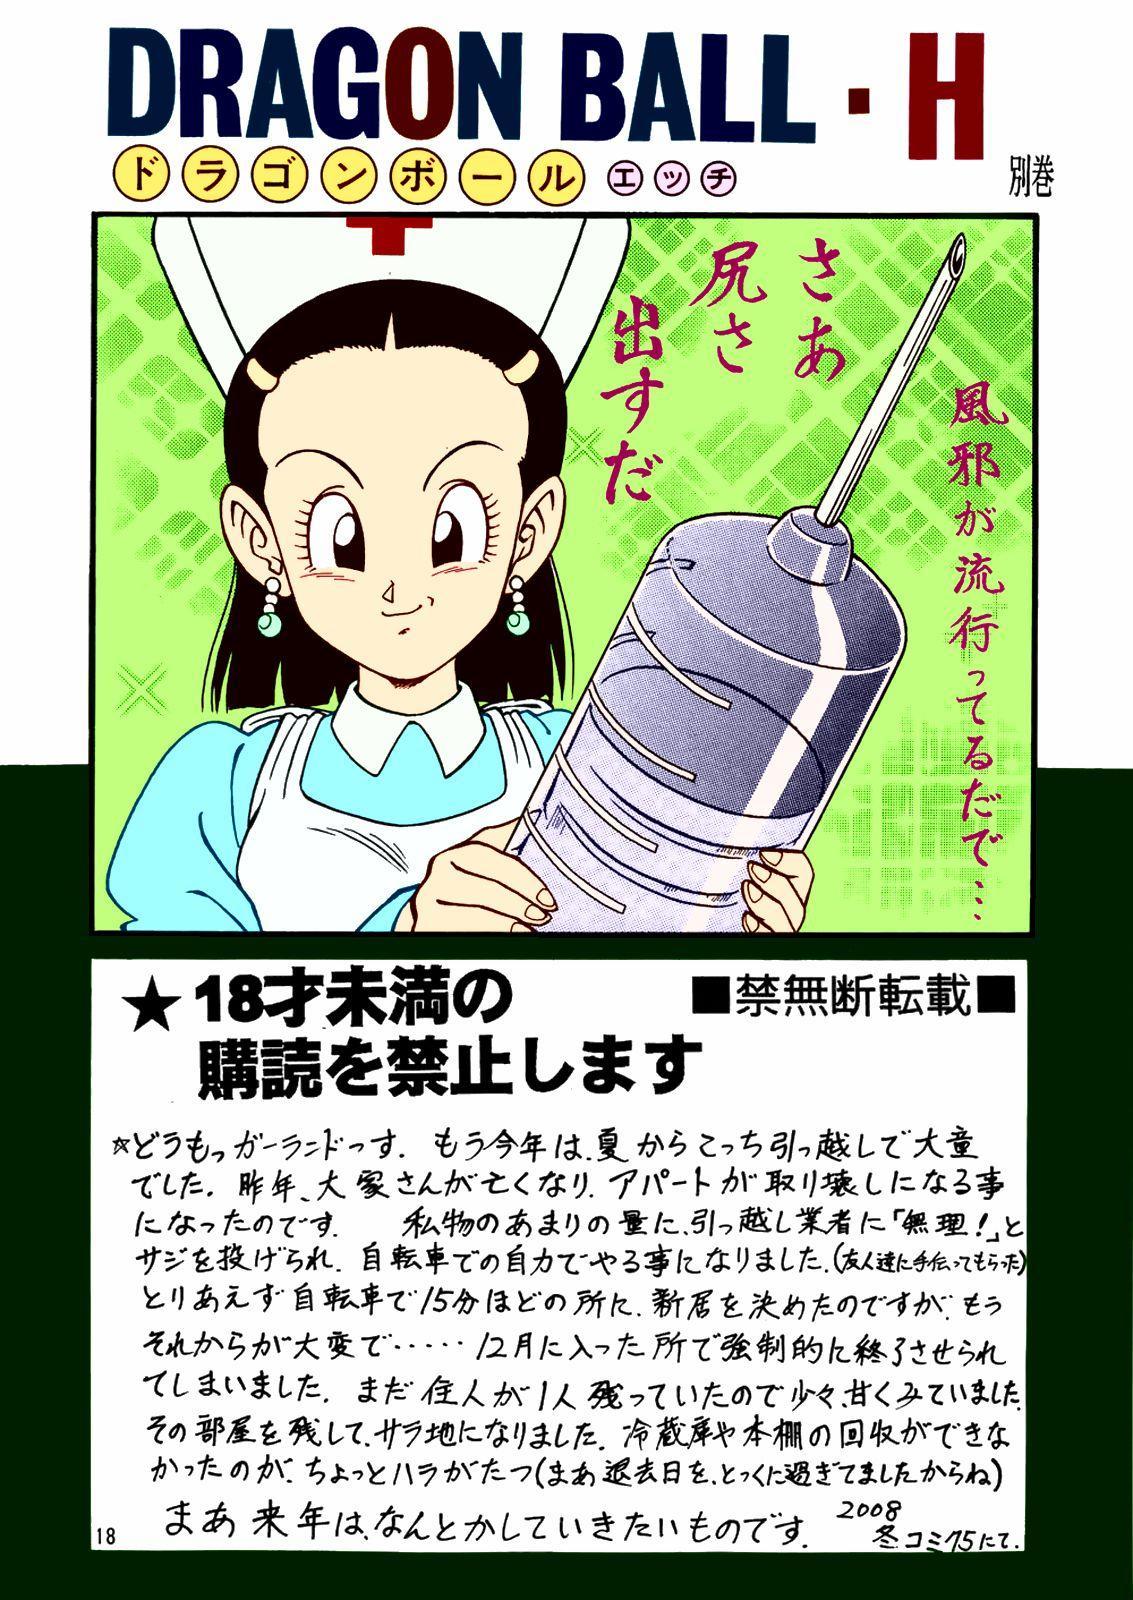 Dragon Ball H Bekkan |  Dragonball H Extra Issue 16